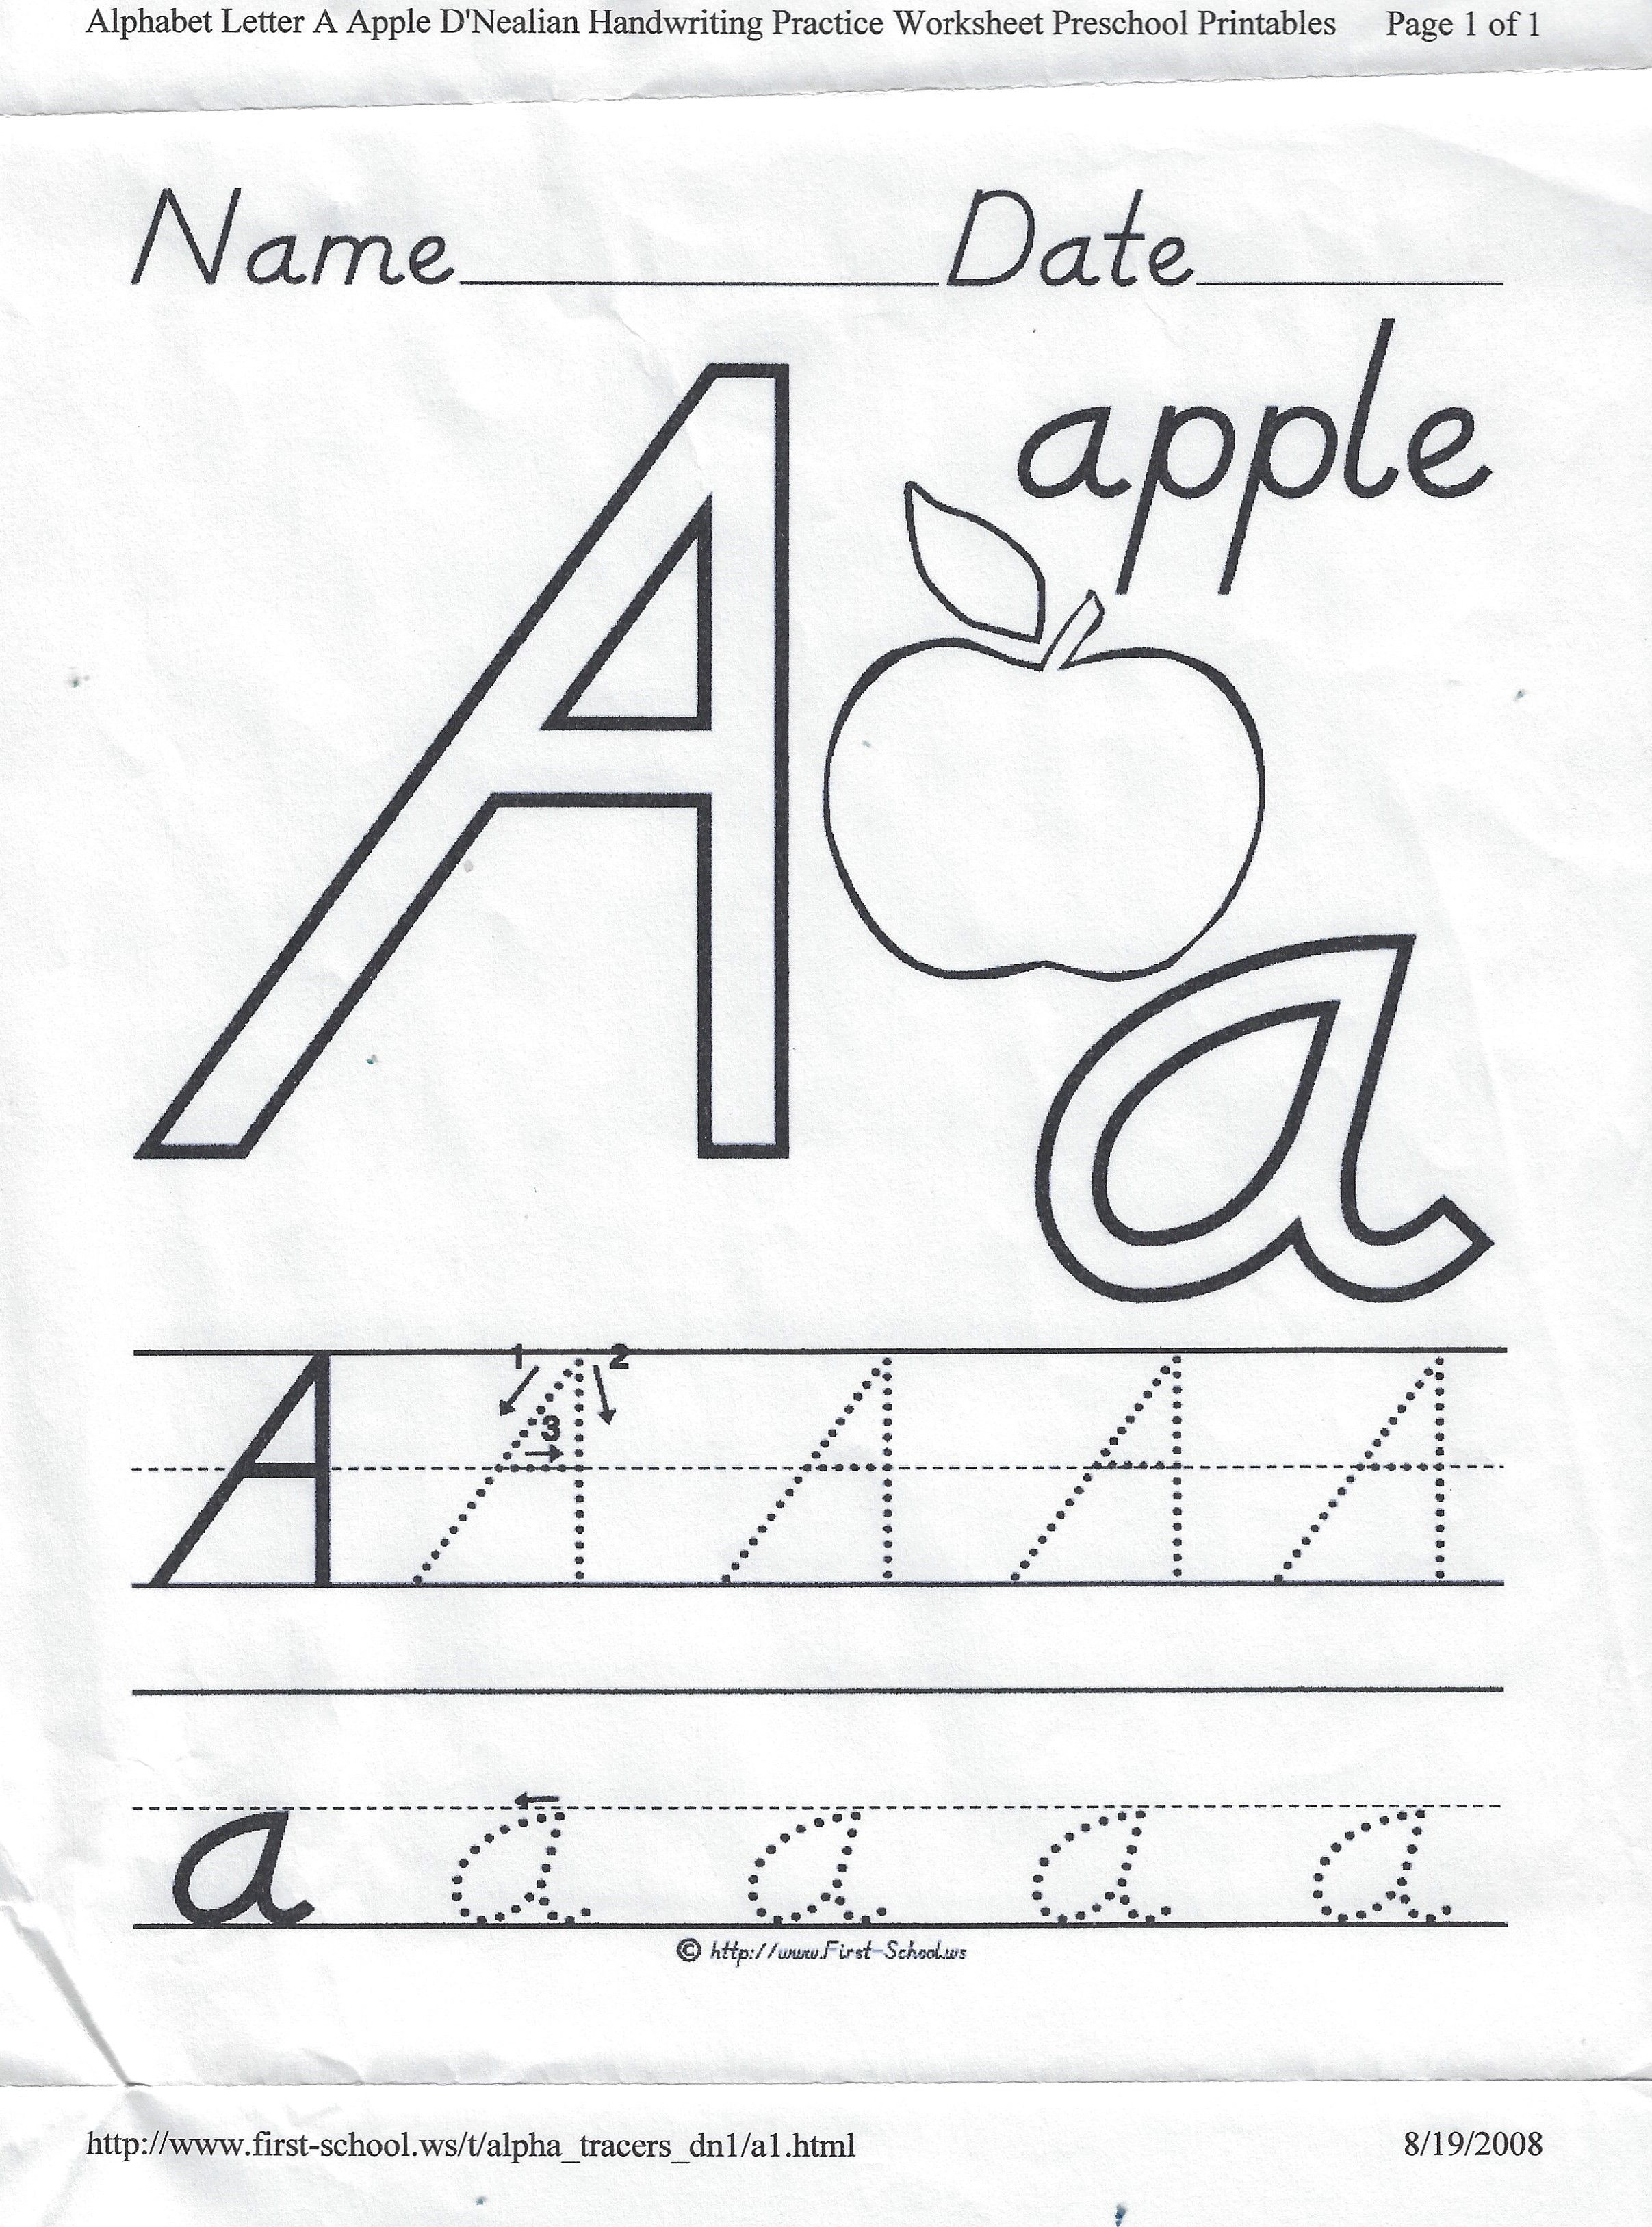 Printable Preschool Worksheets Image By Guylaine Labbe On